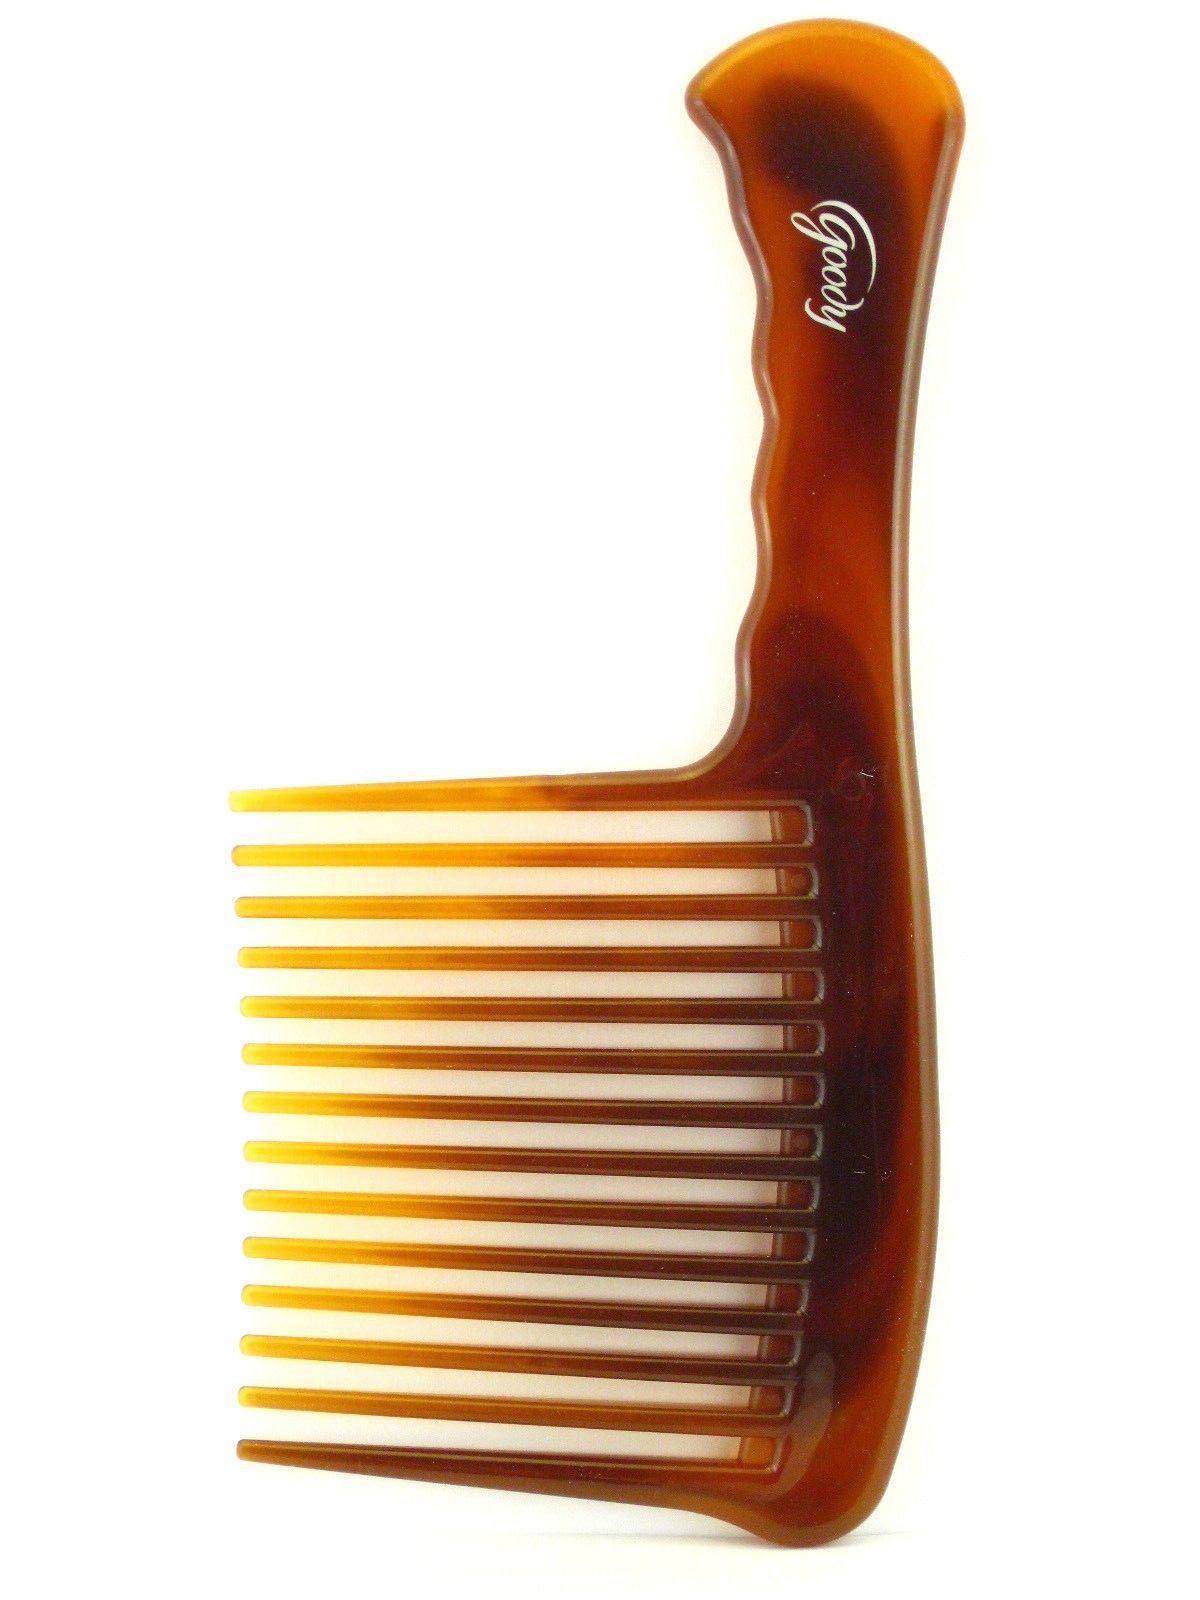 GOODY MOSAIC EXTRA LARGE DETANGLING HAIR COMB - TORTOISE (45617)